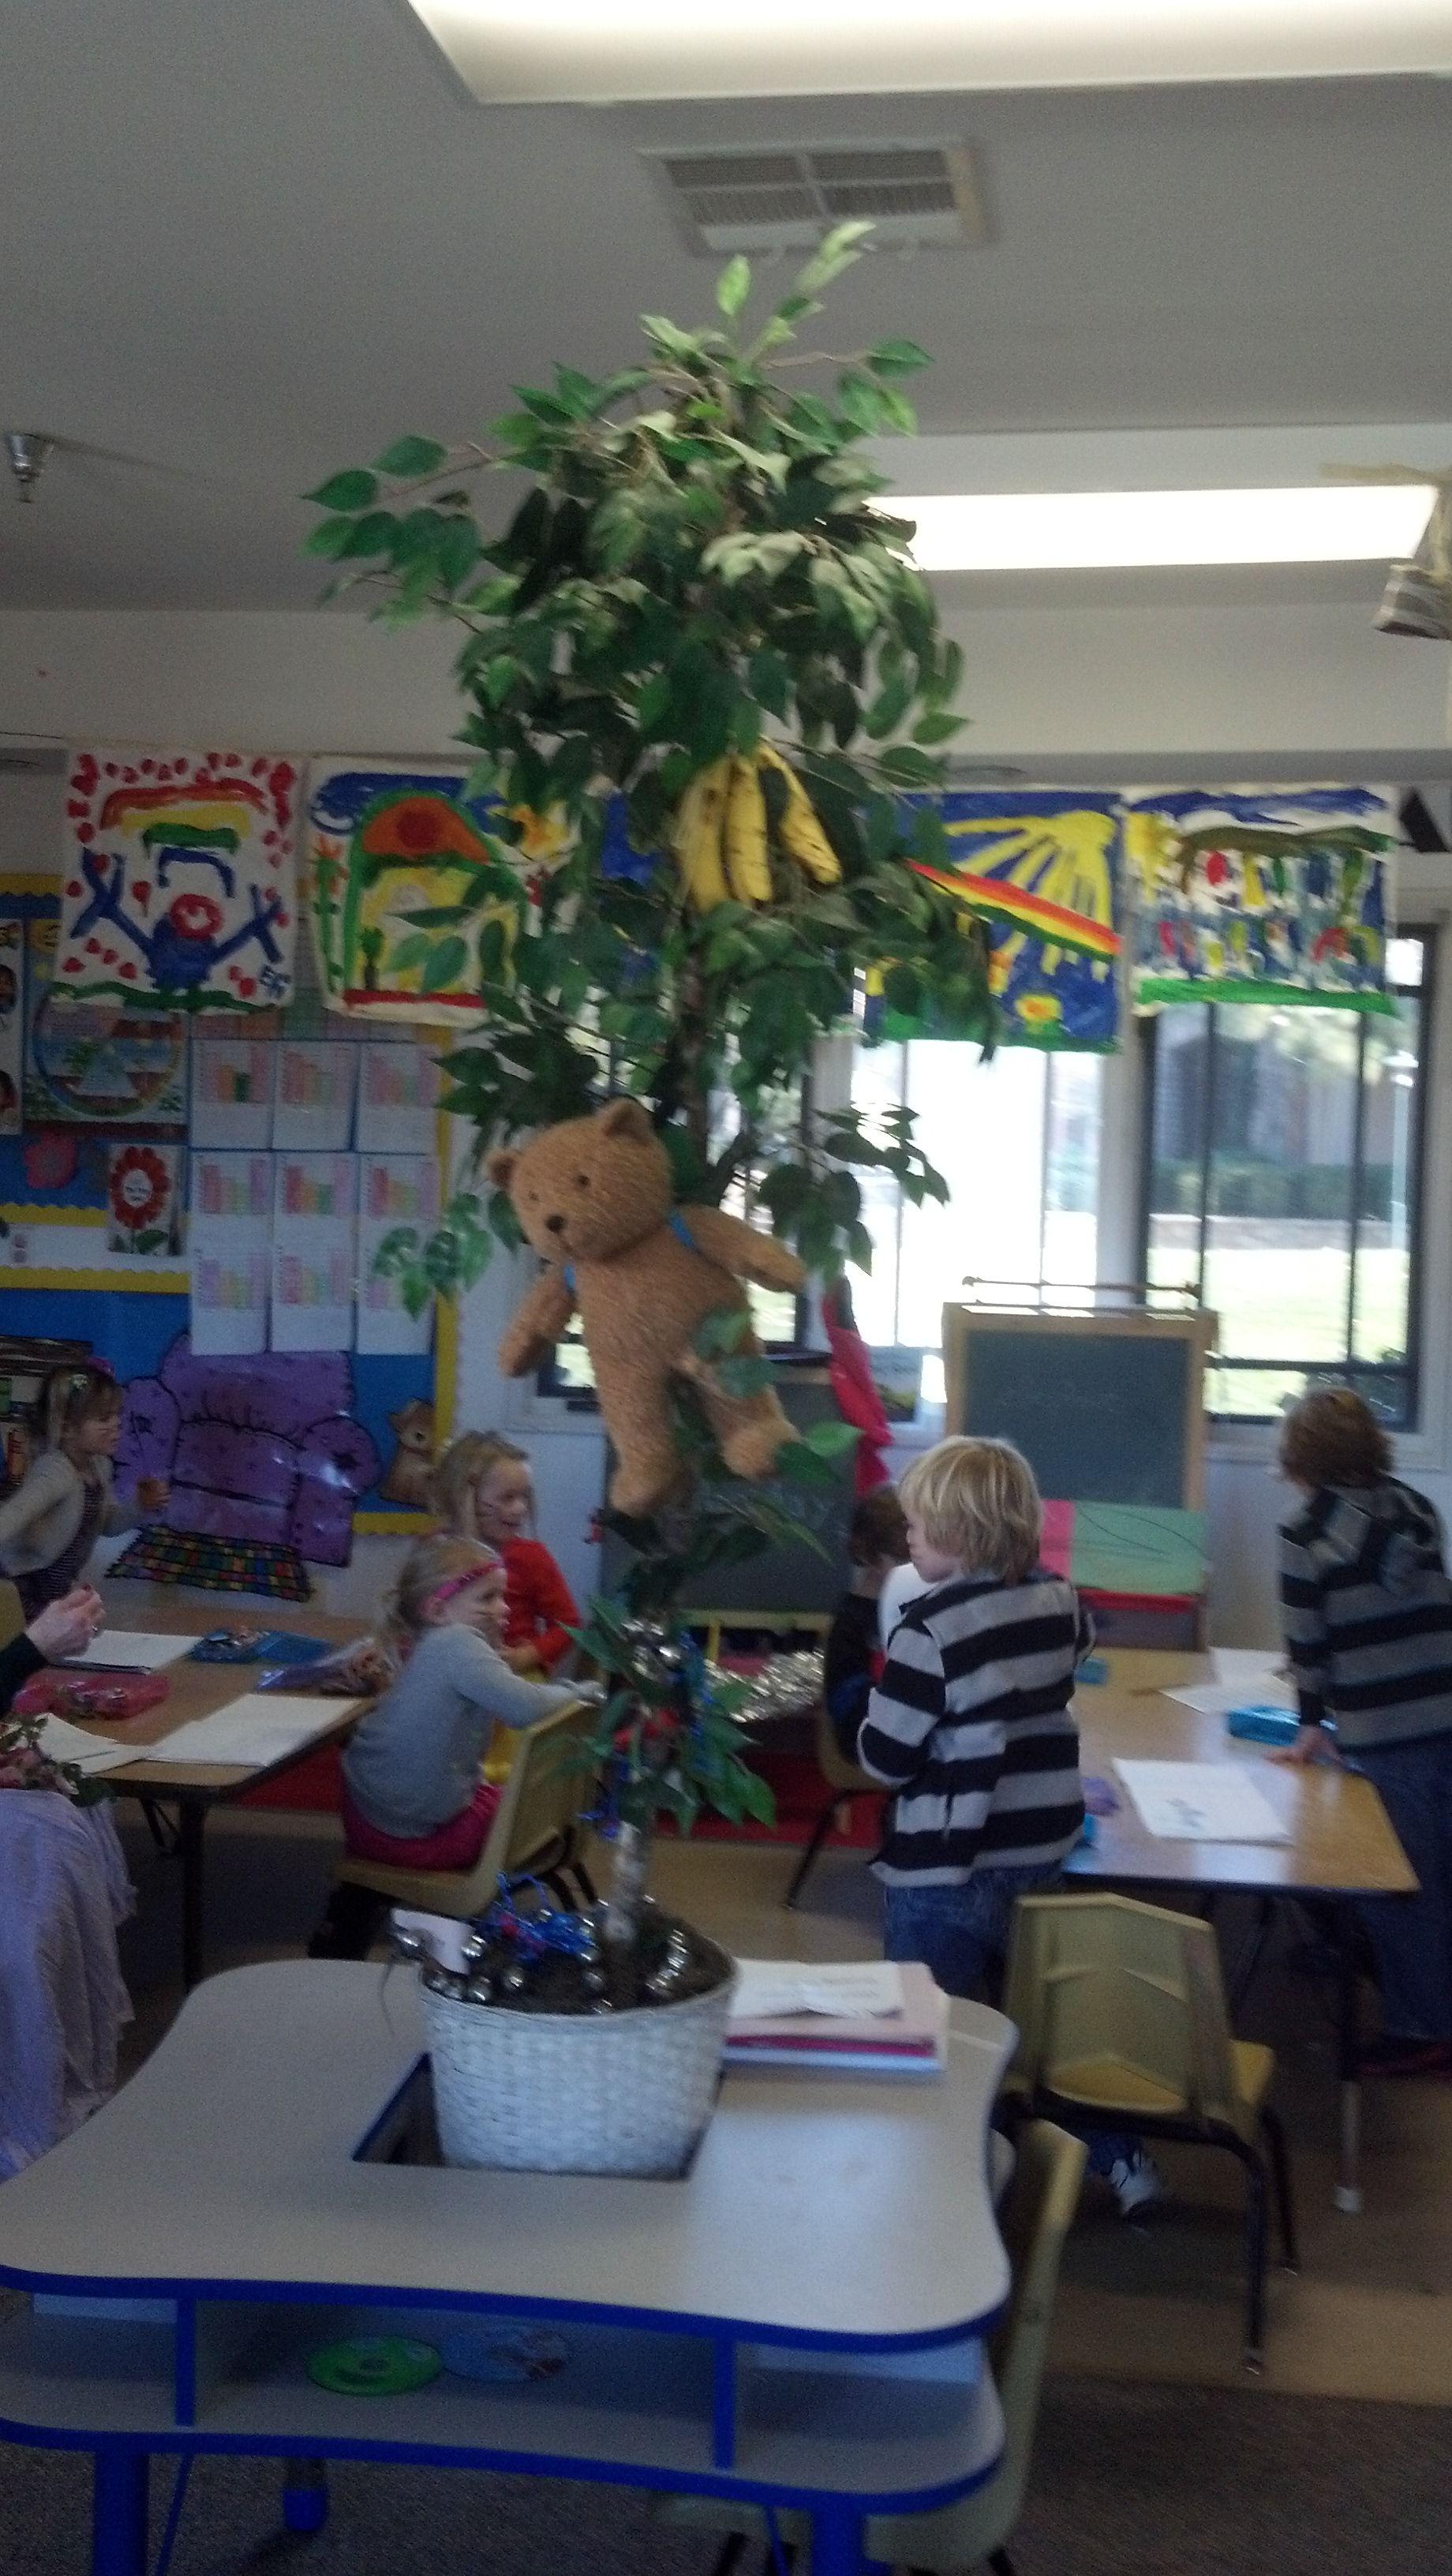 Wacky Wednesday Our Kindergarten Classroom Has Surprises Galore On Wacky Wednesday Brooms And